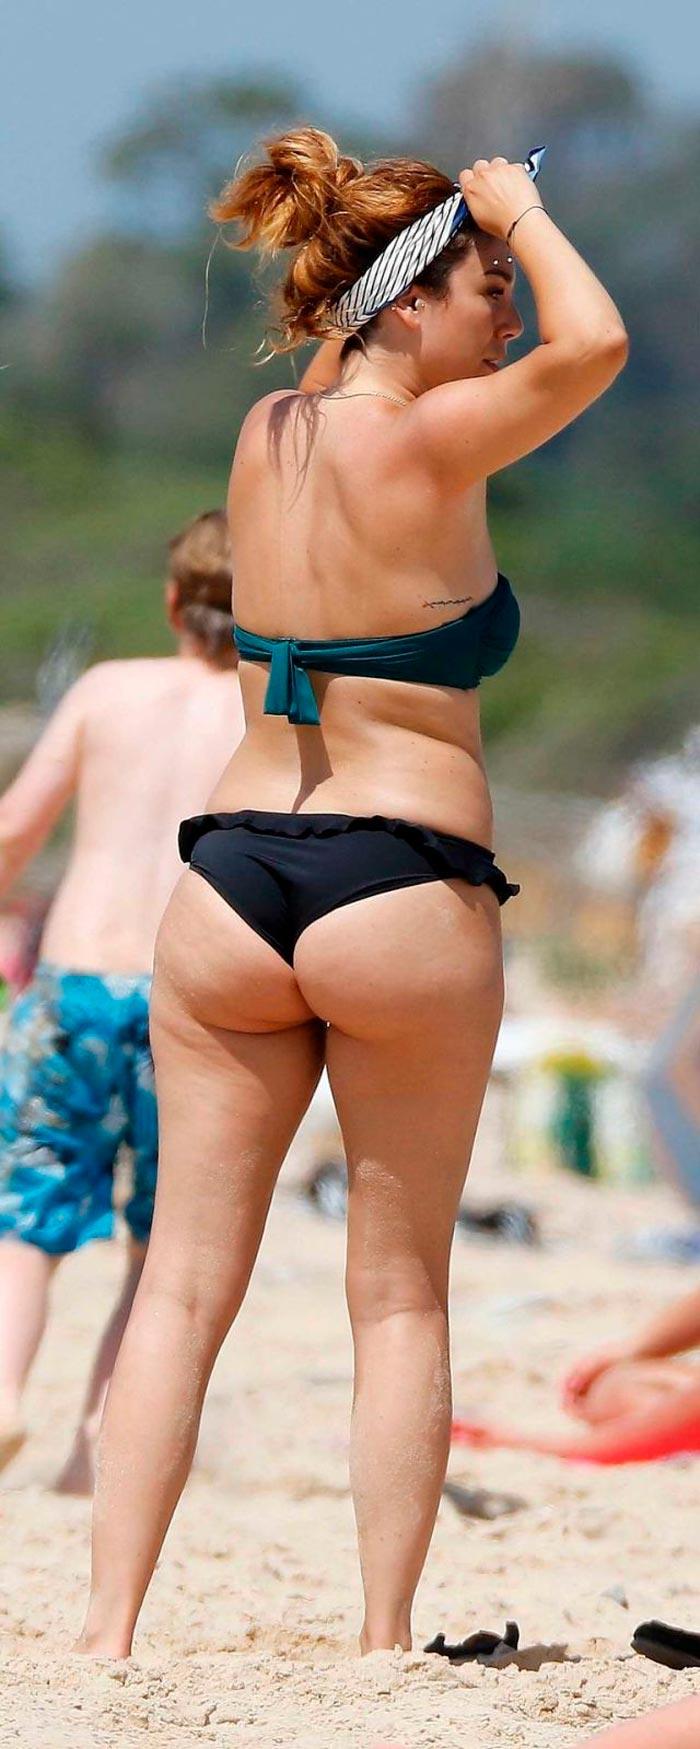 Blanca Suárez Bikini Playa Vacaciones Verano 6 7